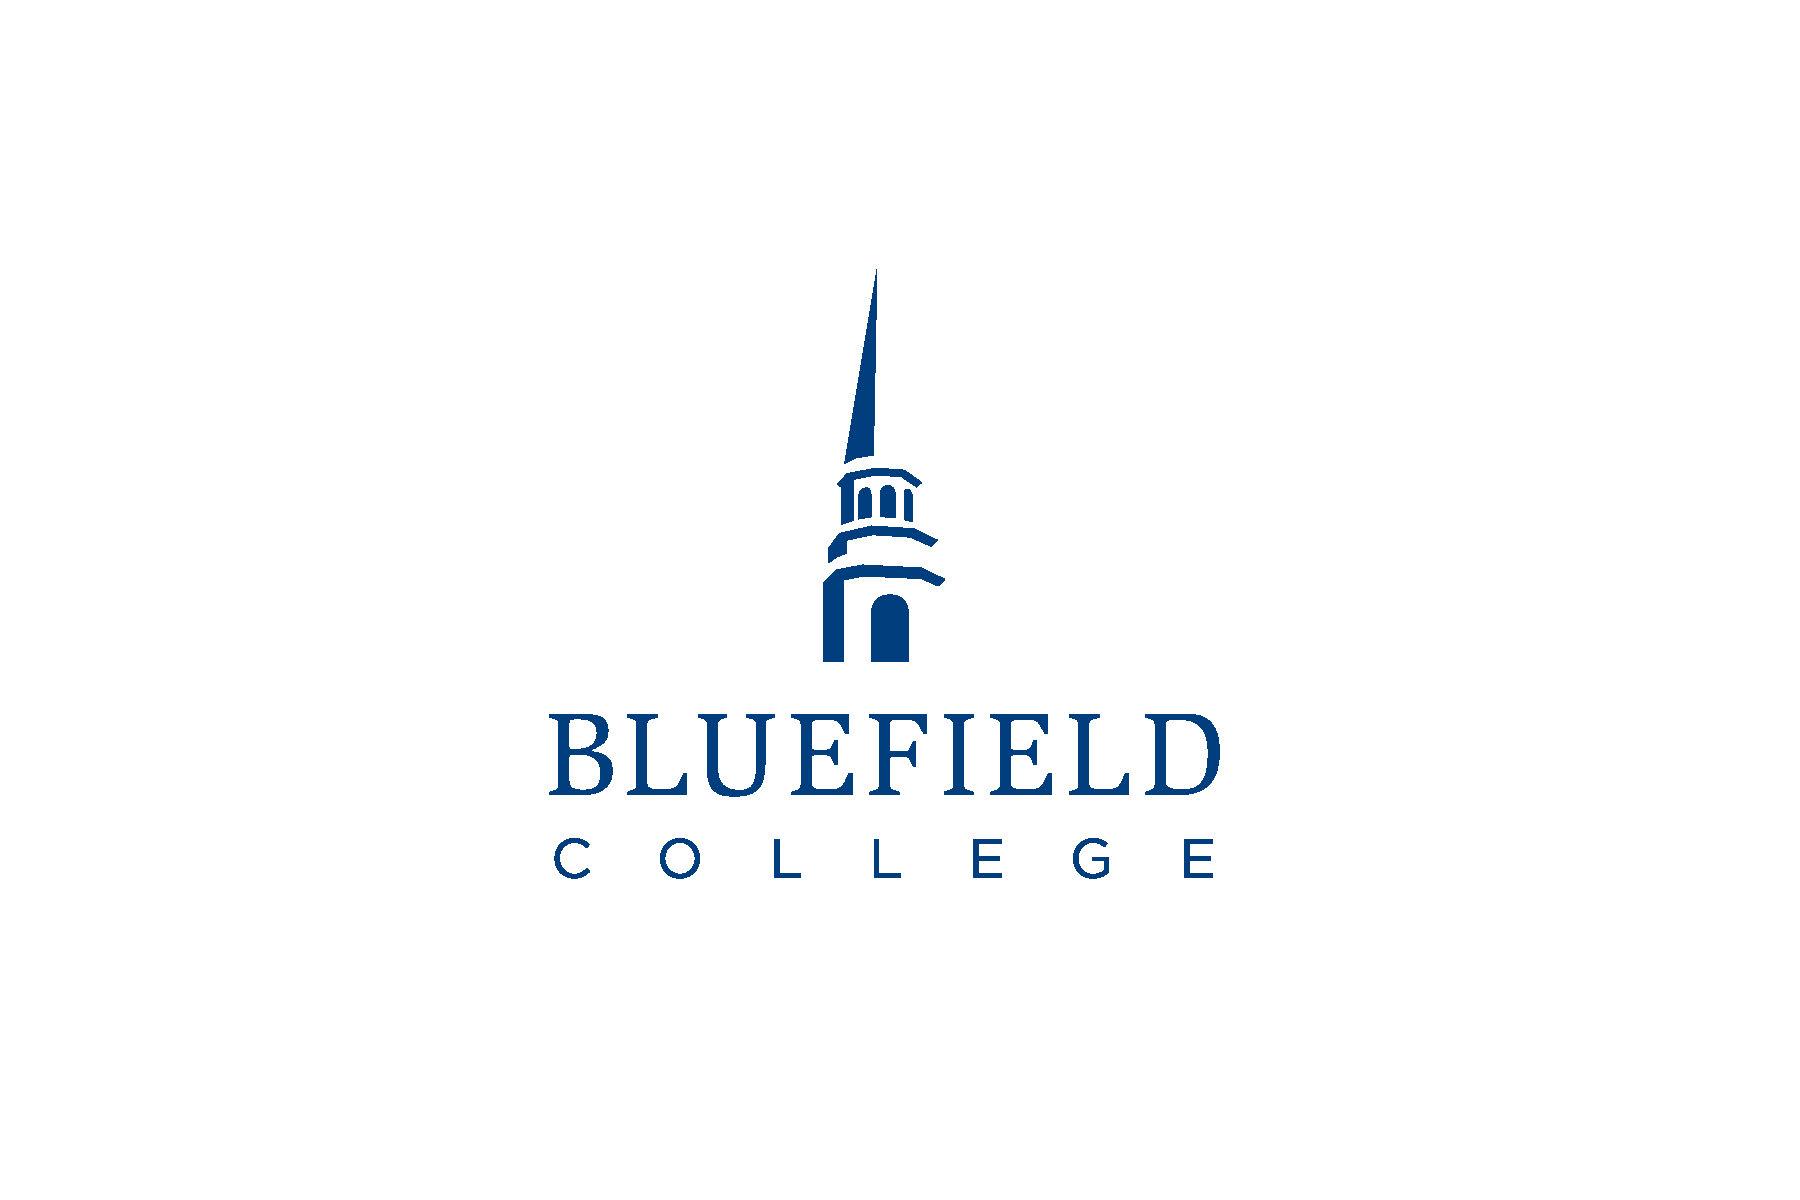 bluefield-college